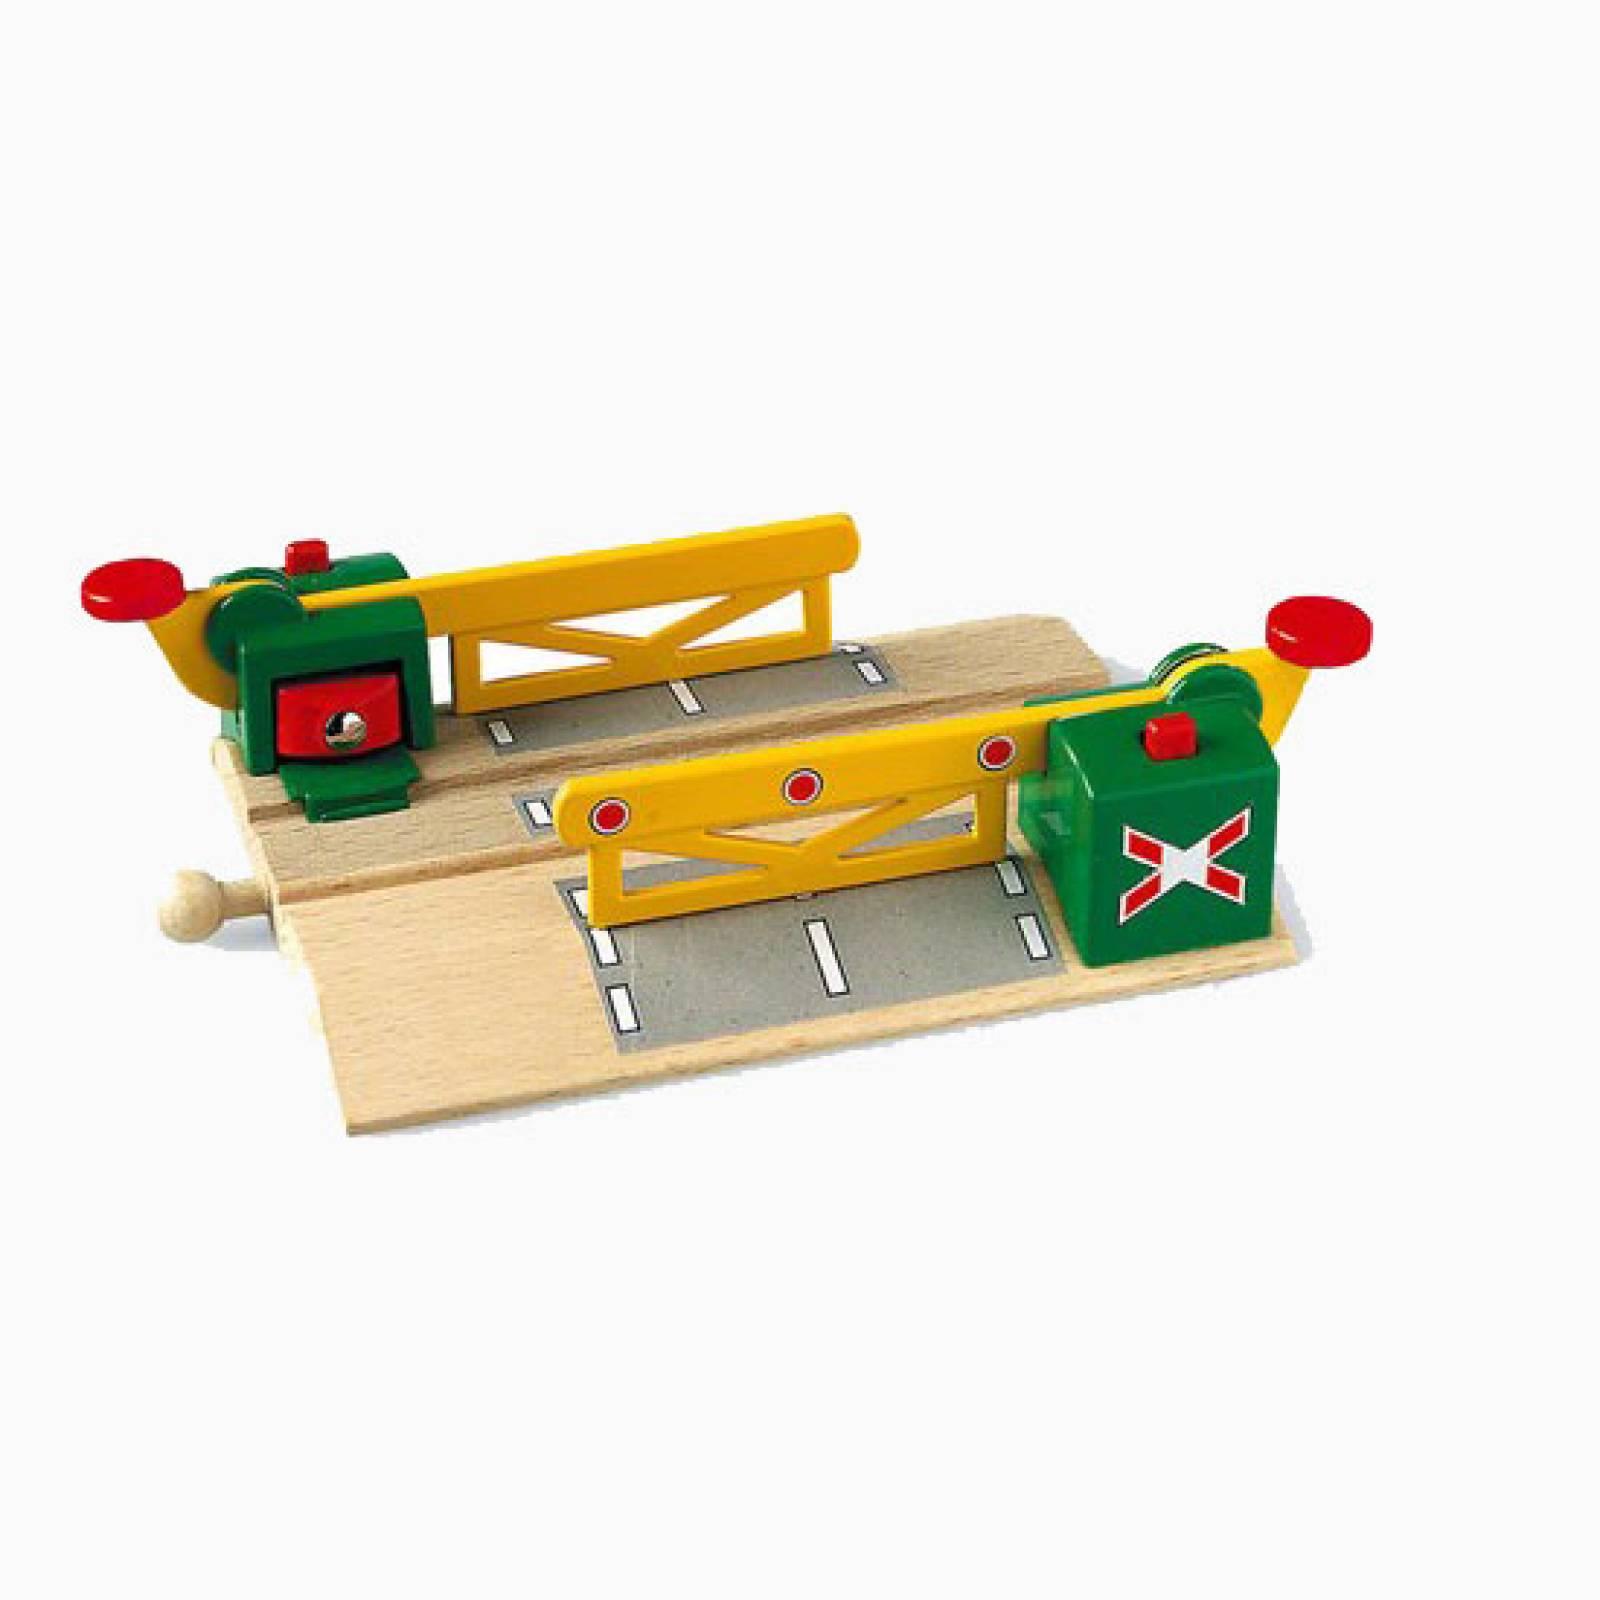 Magnetic Action Crossing BRIO Wooden Railway Age 3+